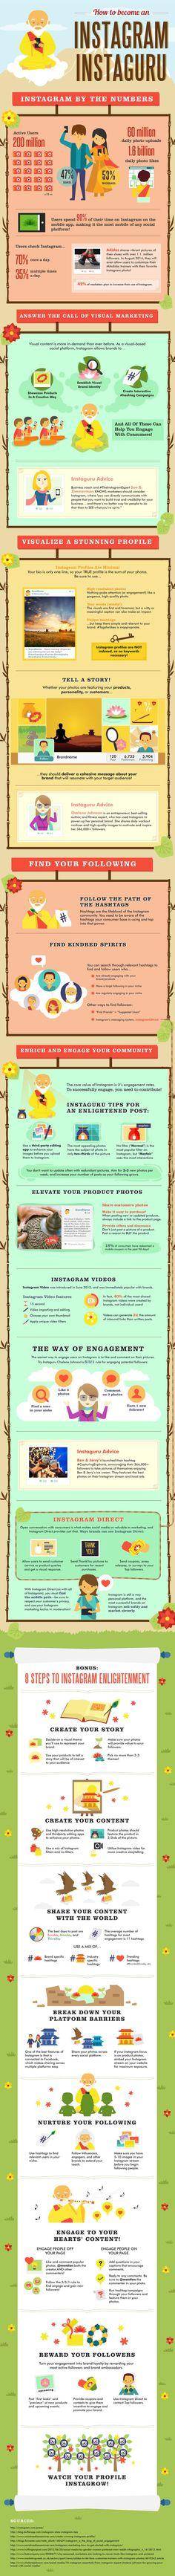 Really want fantastic ideas on internet marketing? Head to my amazing info! Web Social, Social Media Plattformen, Social Media Marketing, Social Networks, Affiliate Marketing, Inbound Marketing, Content Marketing, Marketing Digital, Marketing Na Internet